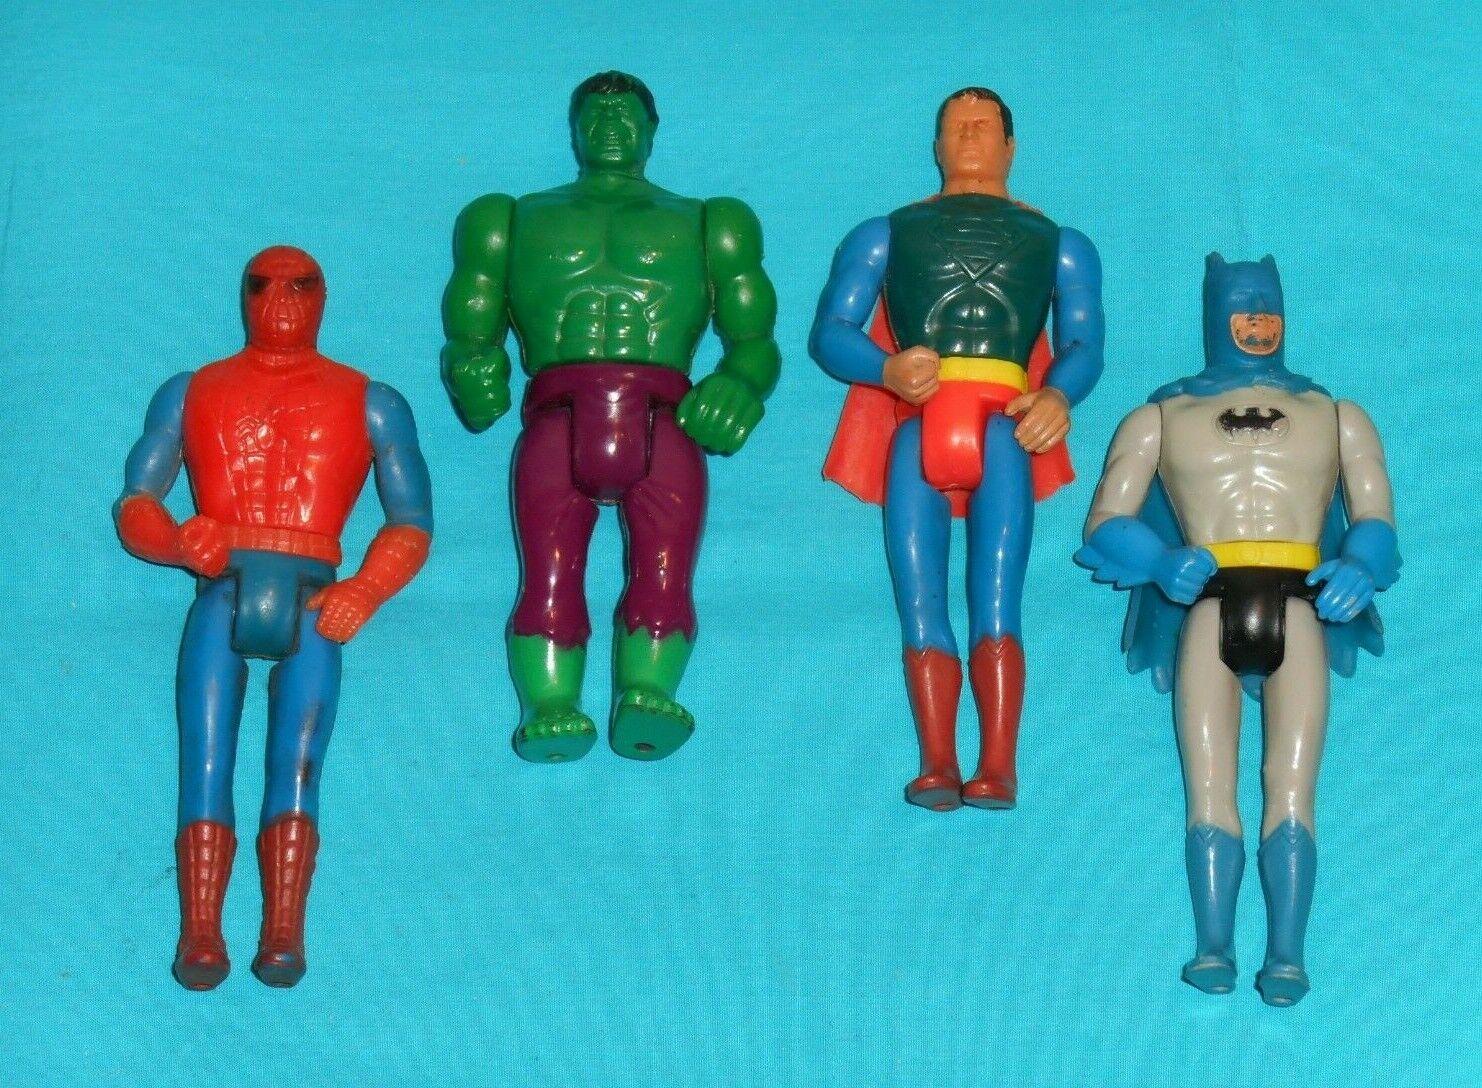 el mas de moda Vintage Mego Mego Mego Bolsillo súperheroes Lote x4 súperman Hombre Araña Batman Hulk  comprar descuentos